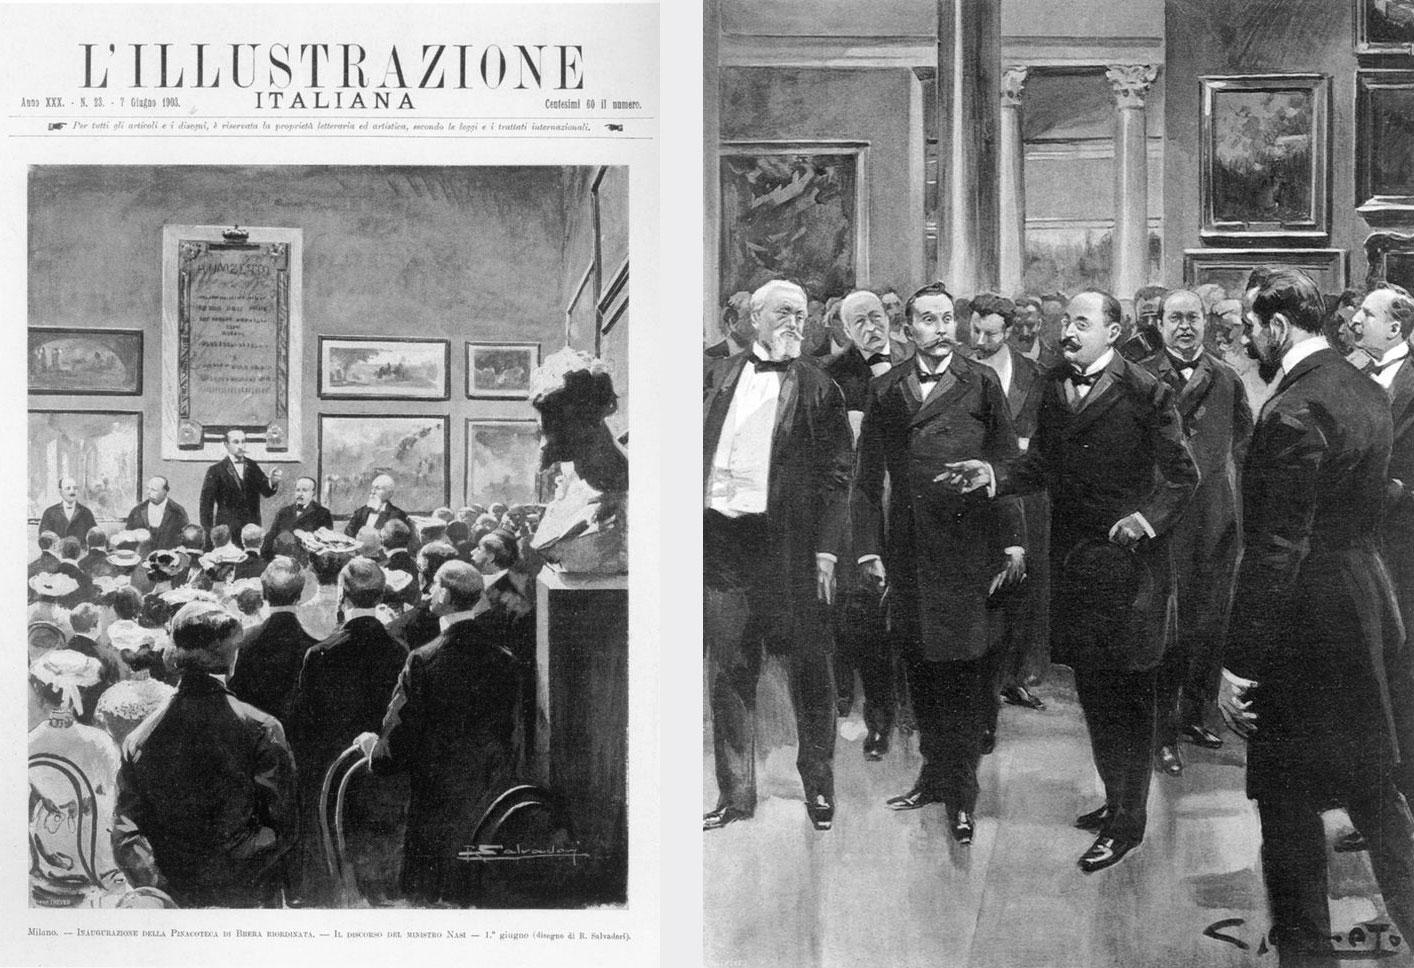 Minister Nasi visits the refurbished Pinacoteca on 7 June 1903